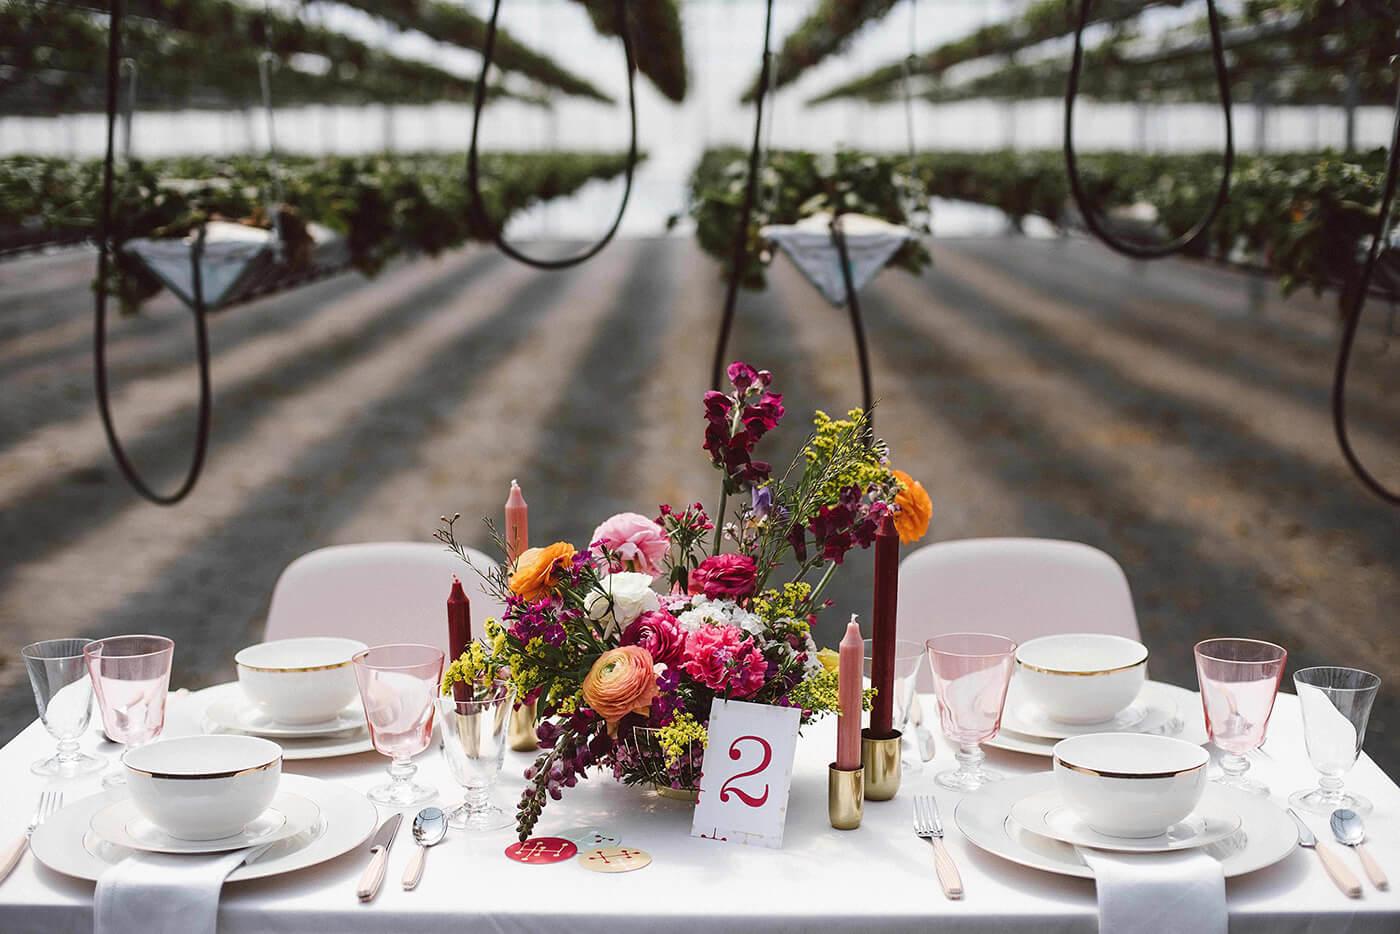 roma-organizacao-eventos-editorial-mid-century-modern-wedding-in-a-strawberry-field-04